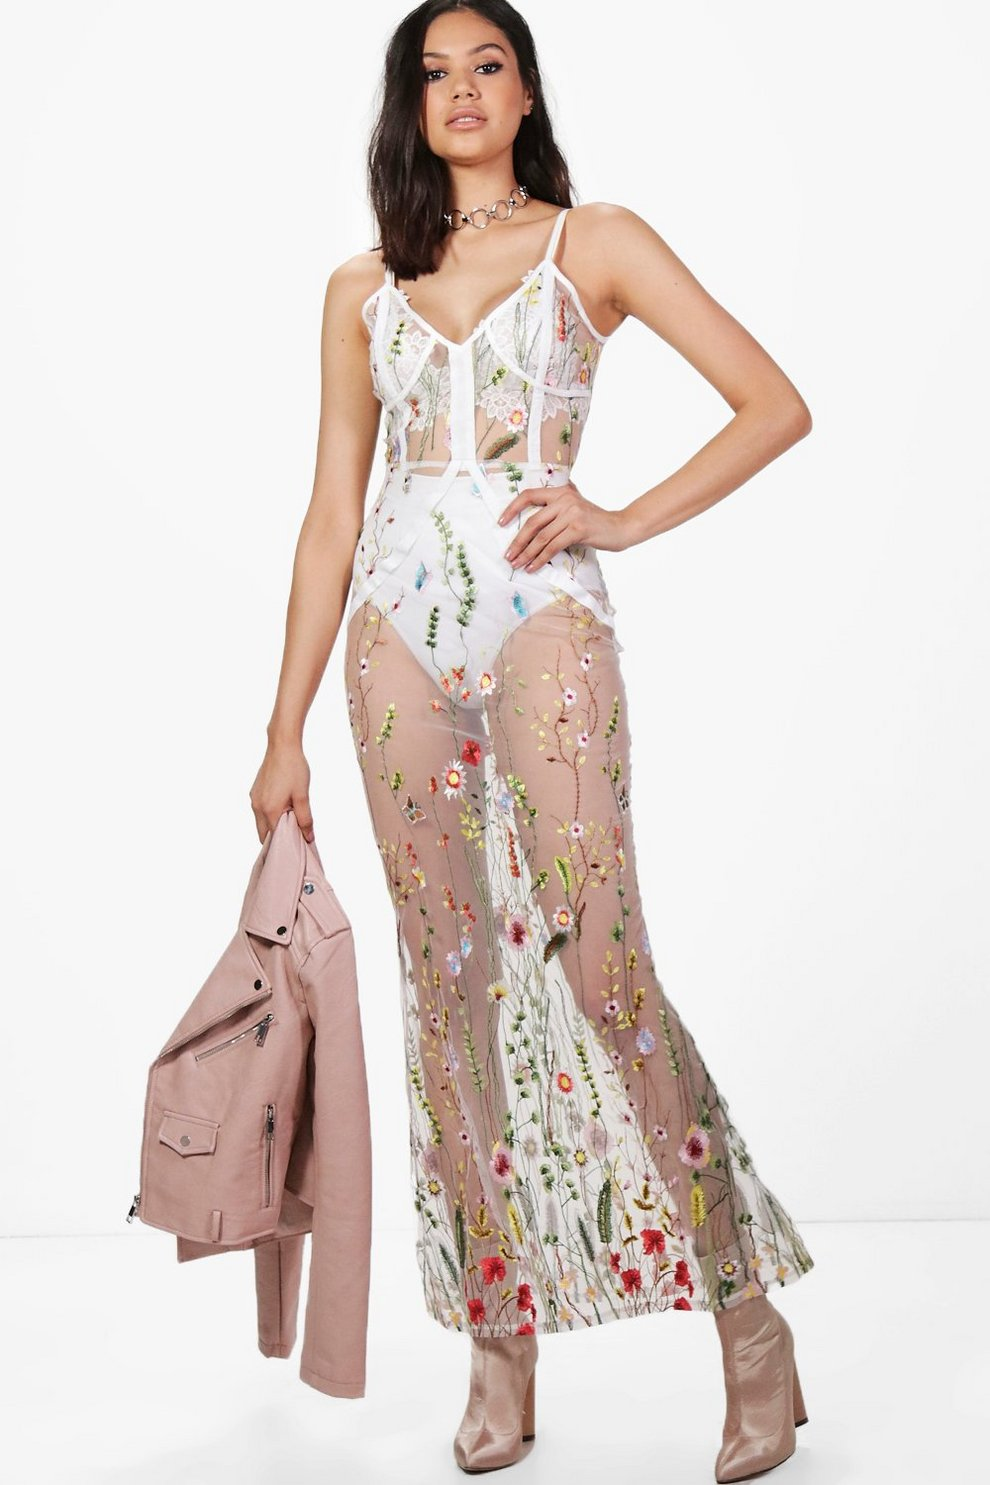 7f1e3f4d49f5 Boutique Niamh Floral Embroidered Maxi Dress | Boohoo